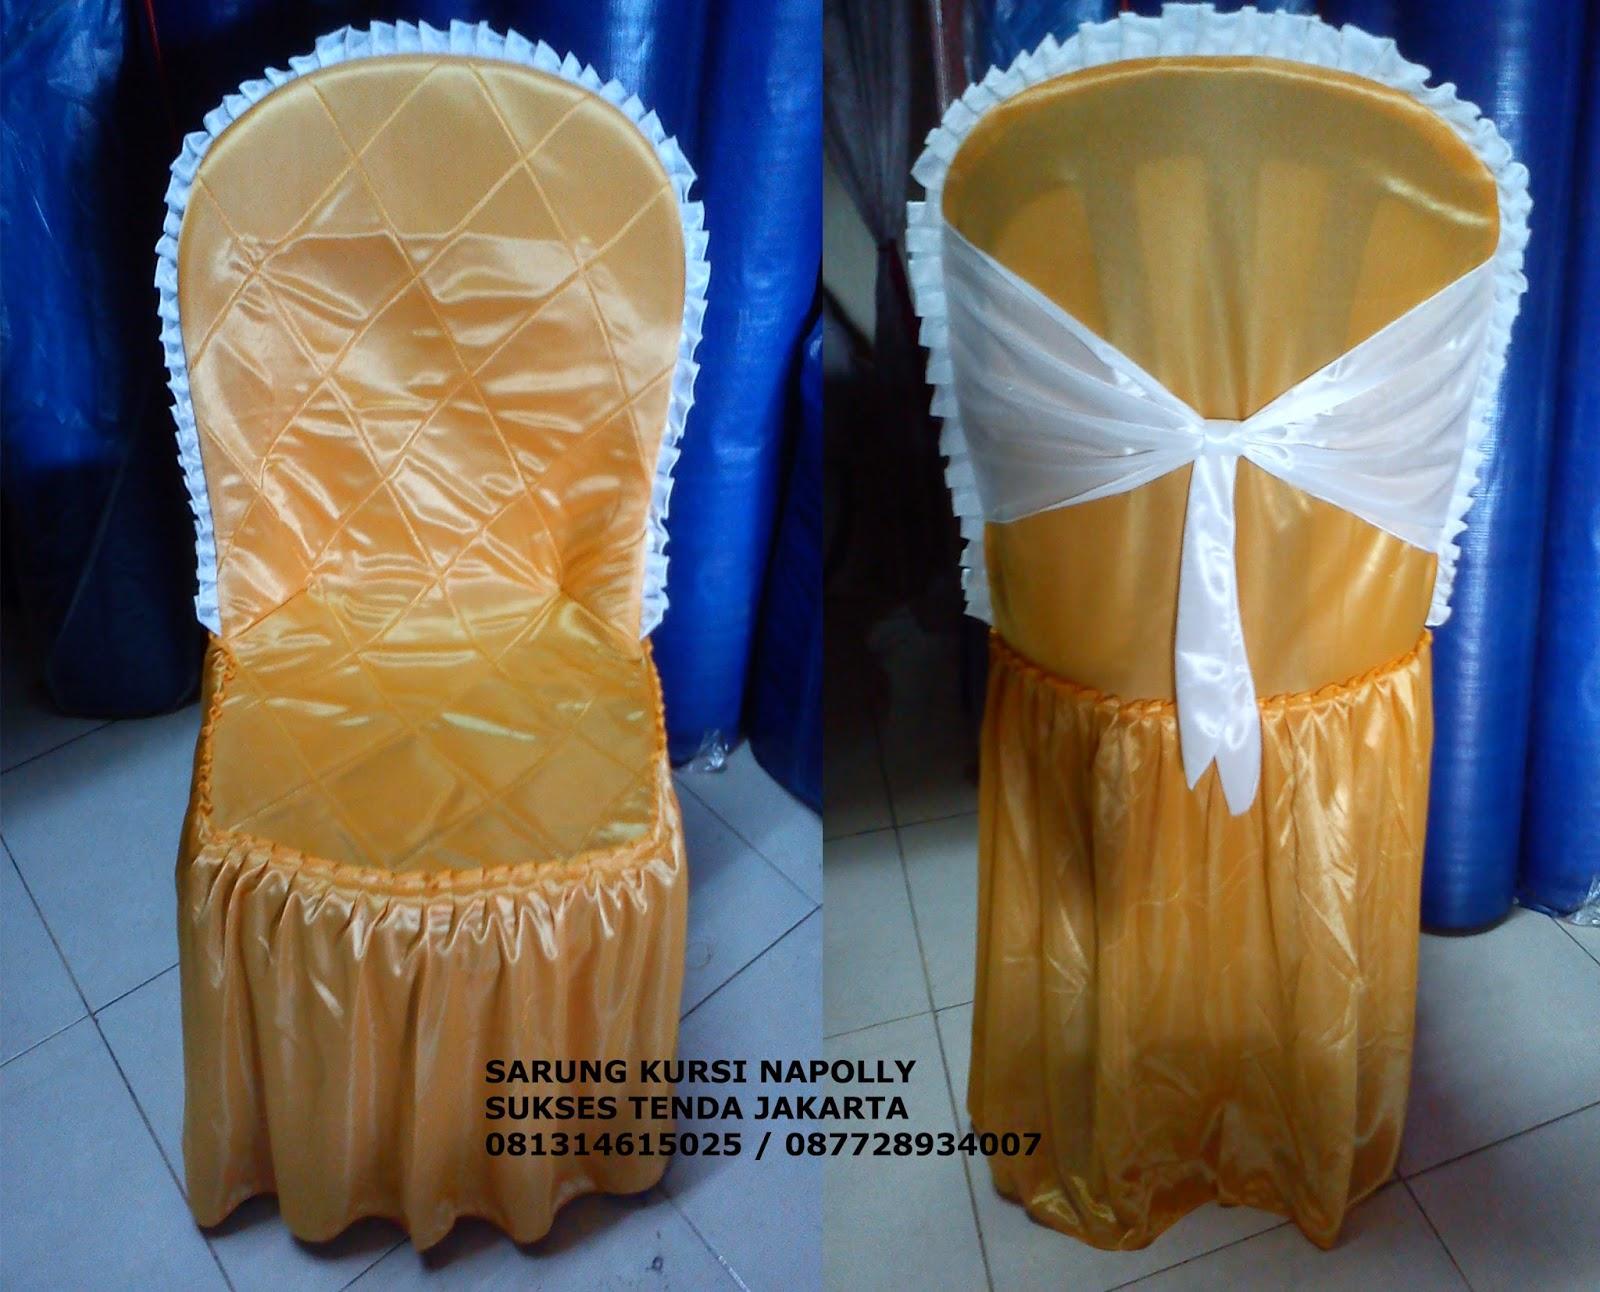 sarung kursi plastik murah berkualitas